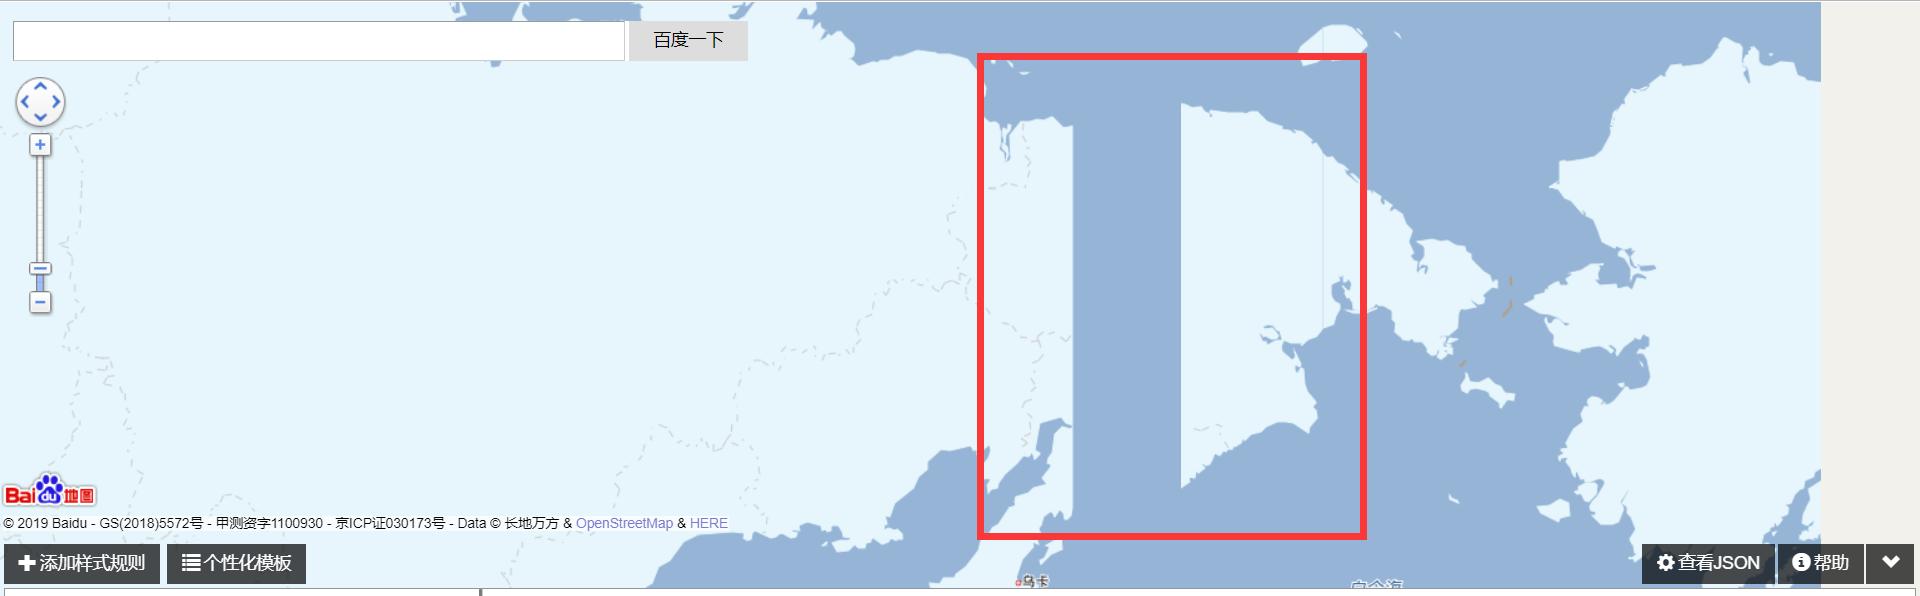 baidu 自定义地图